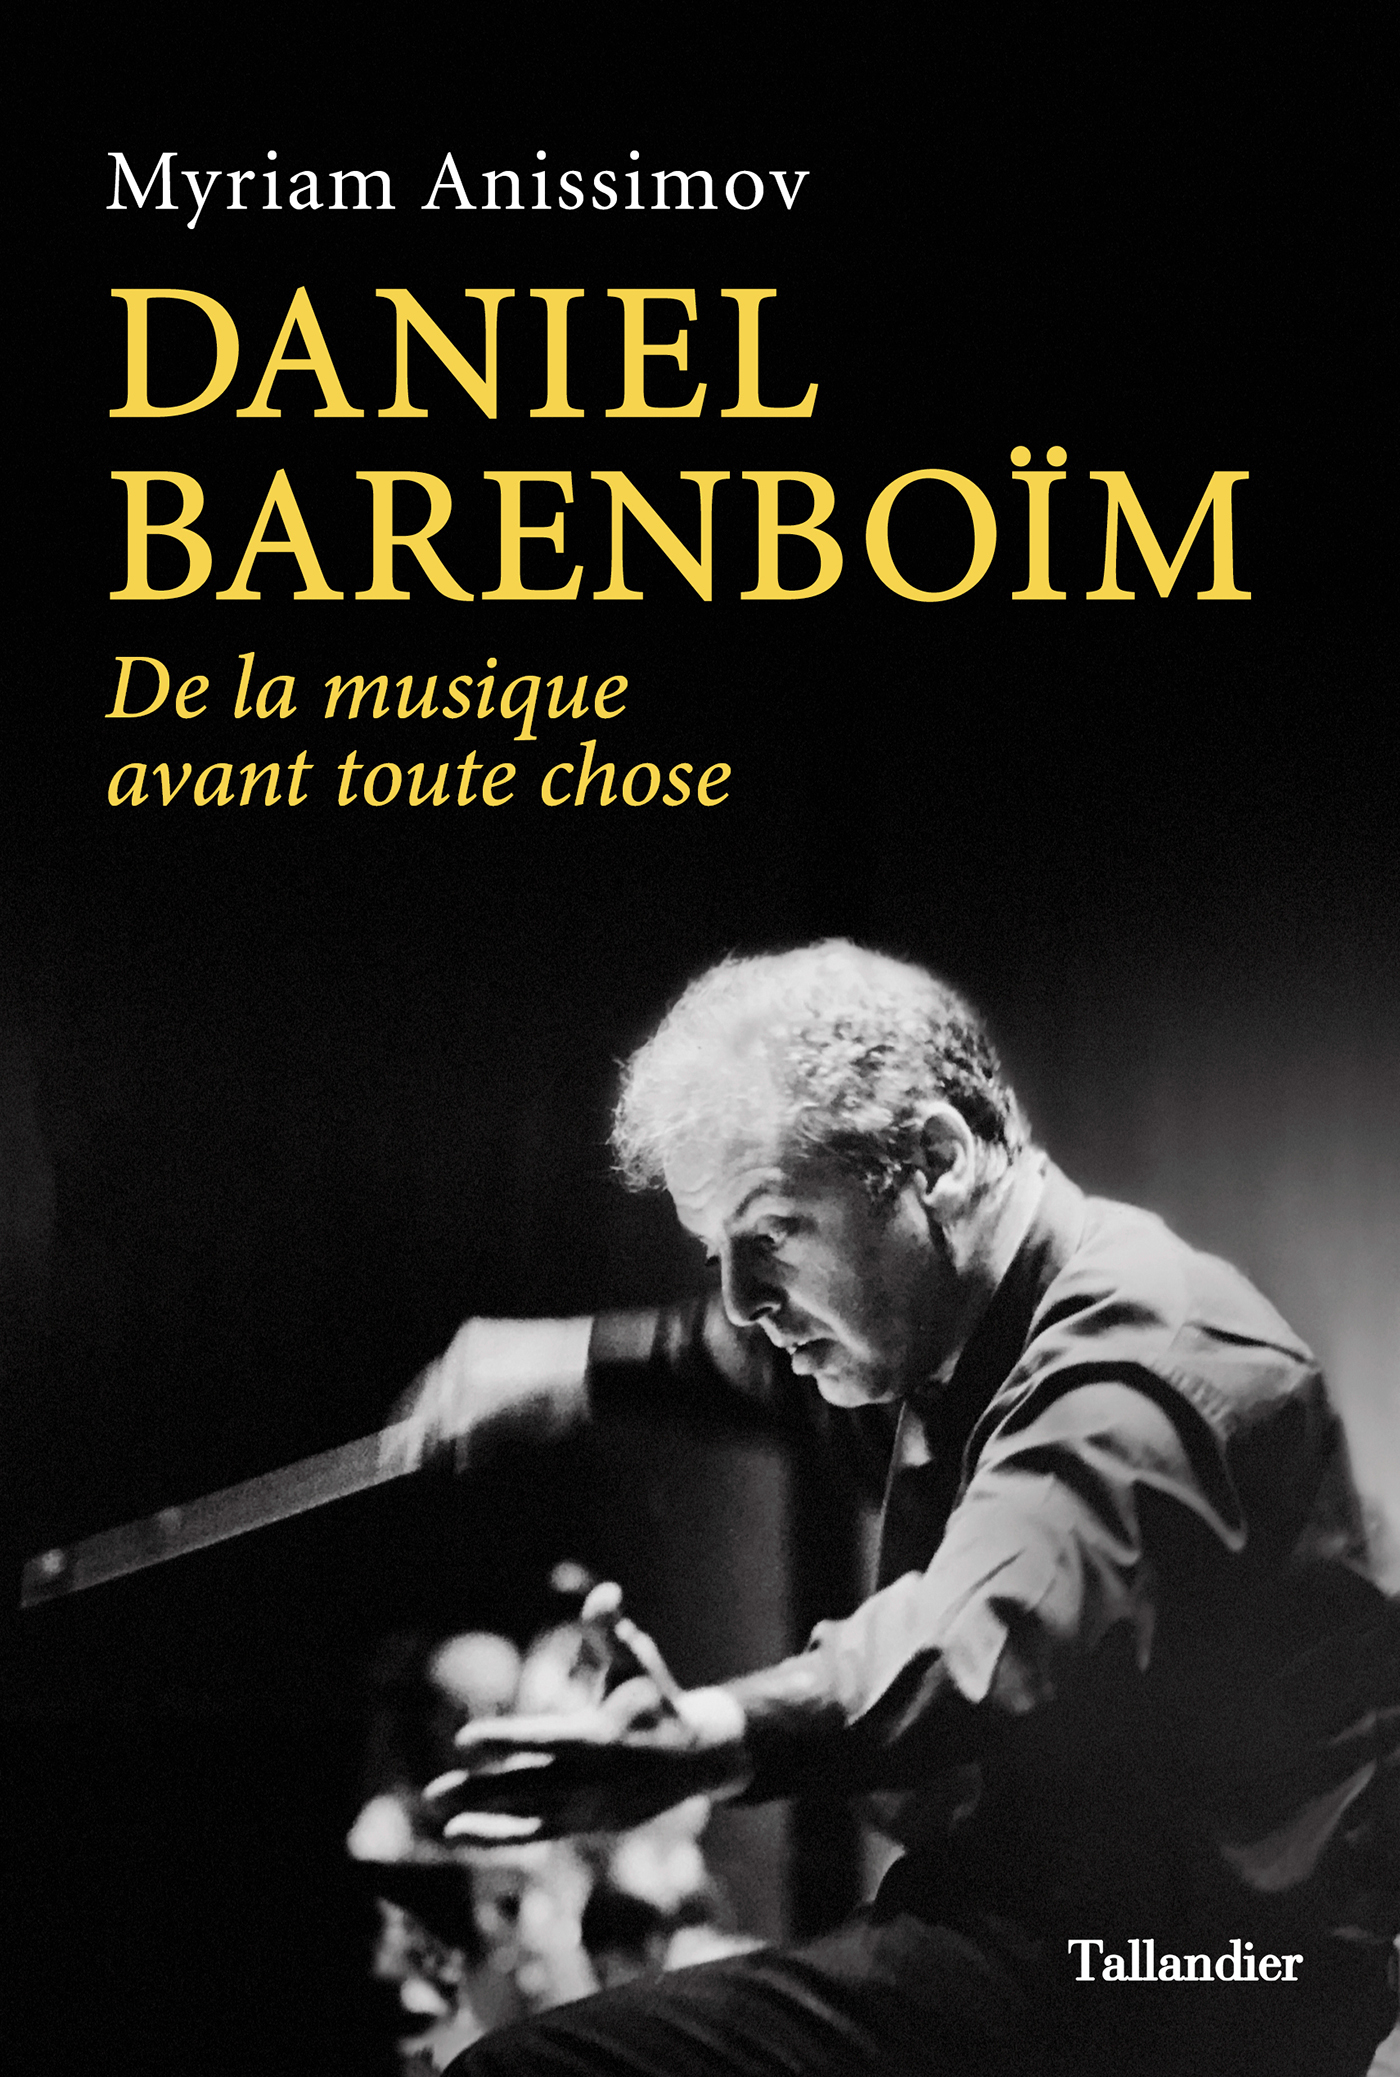 Daniel Barenbo?m